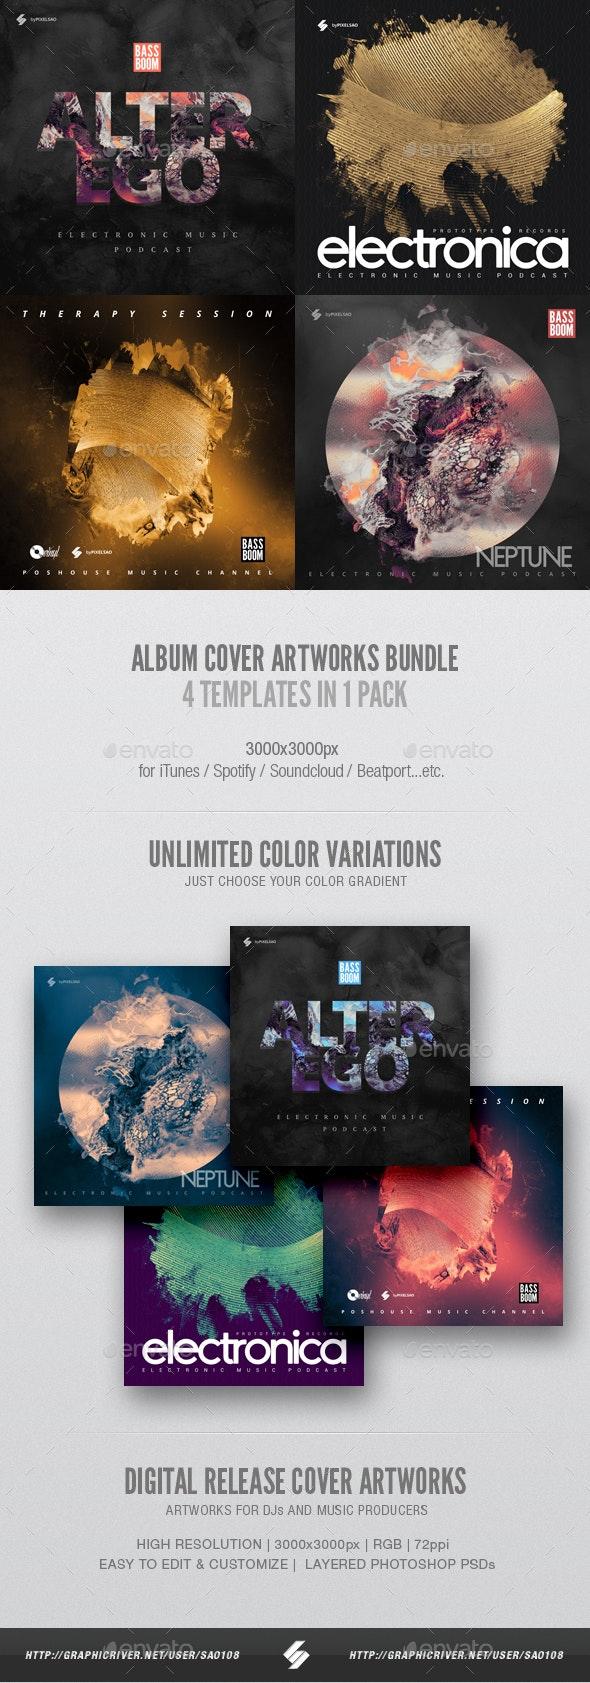 Electronic Music Album Cover Artwork Templates Bundle 9 - Miscellaneous Social Media